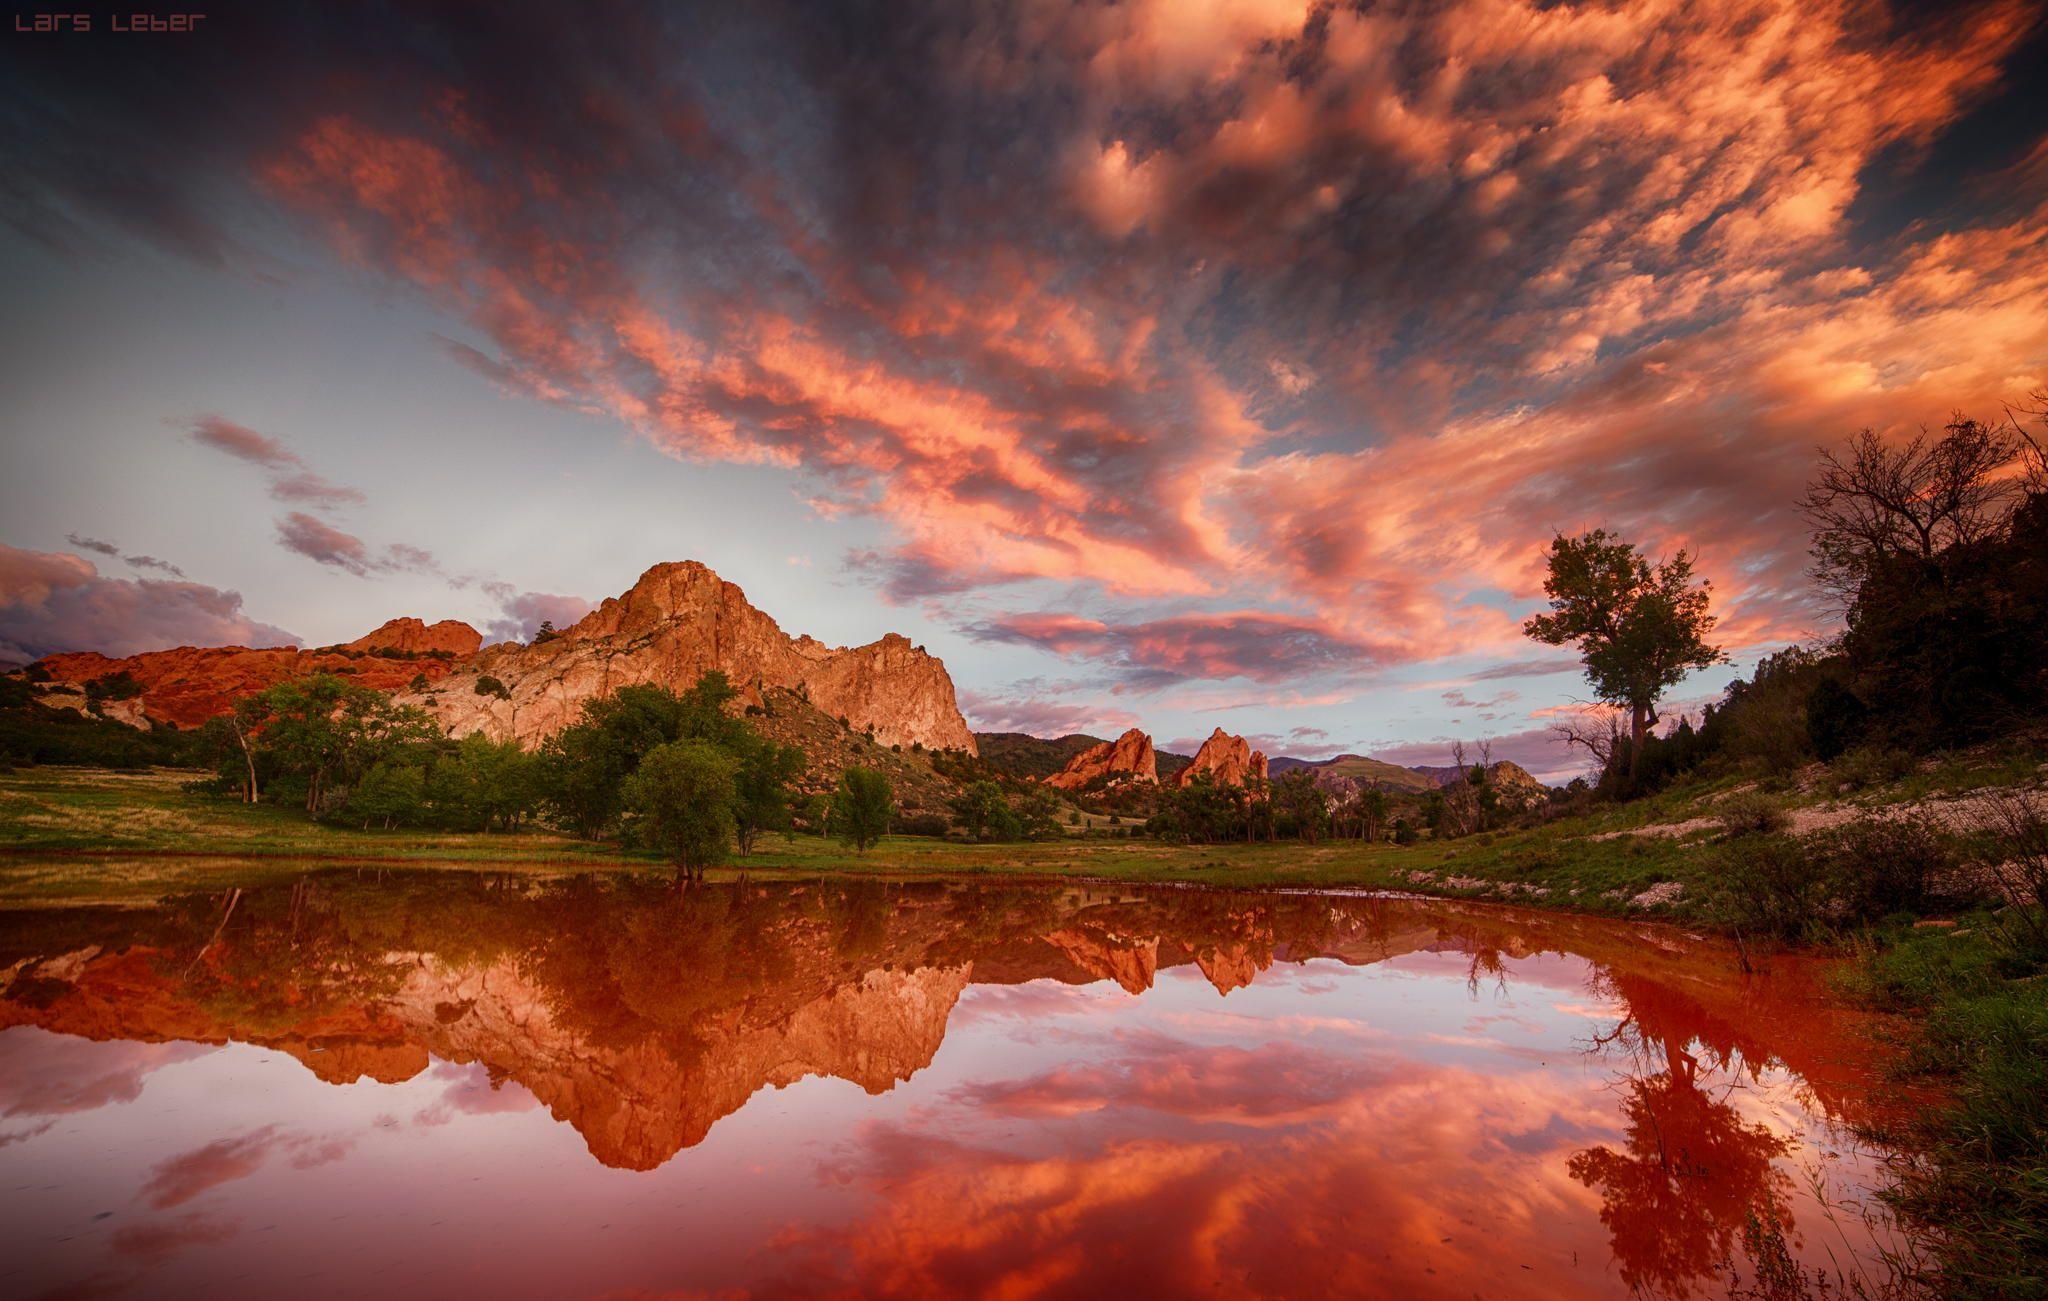 Garden Of The Gods Colorado Springs Sunset